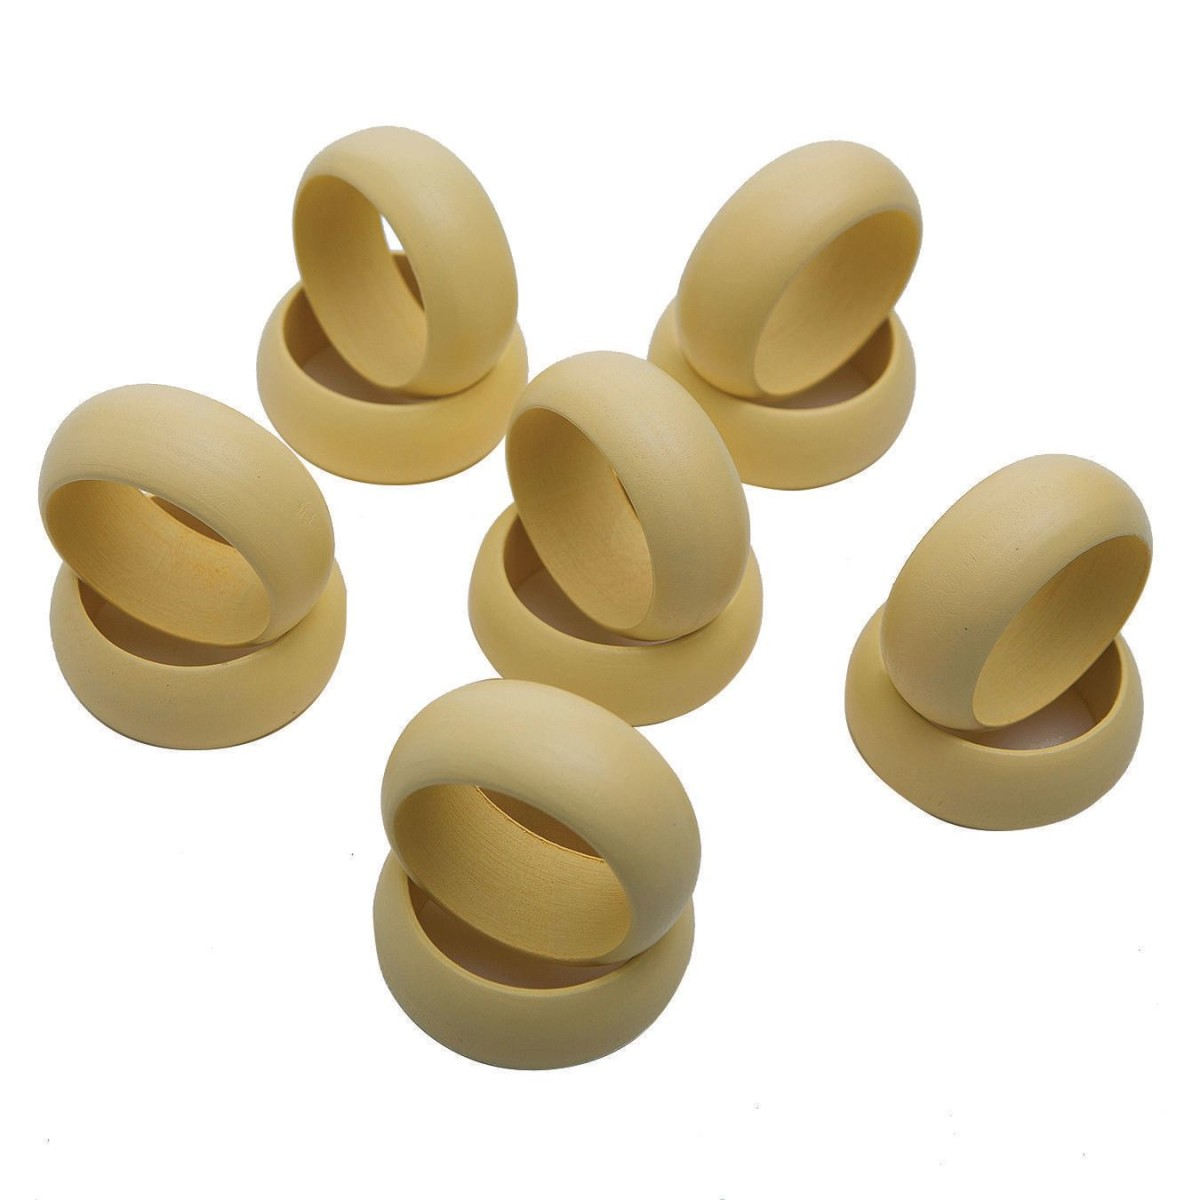 Small Wooden BANGLE Bracelet (pack of 12)